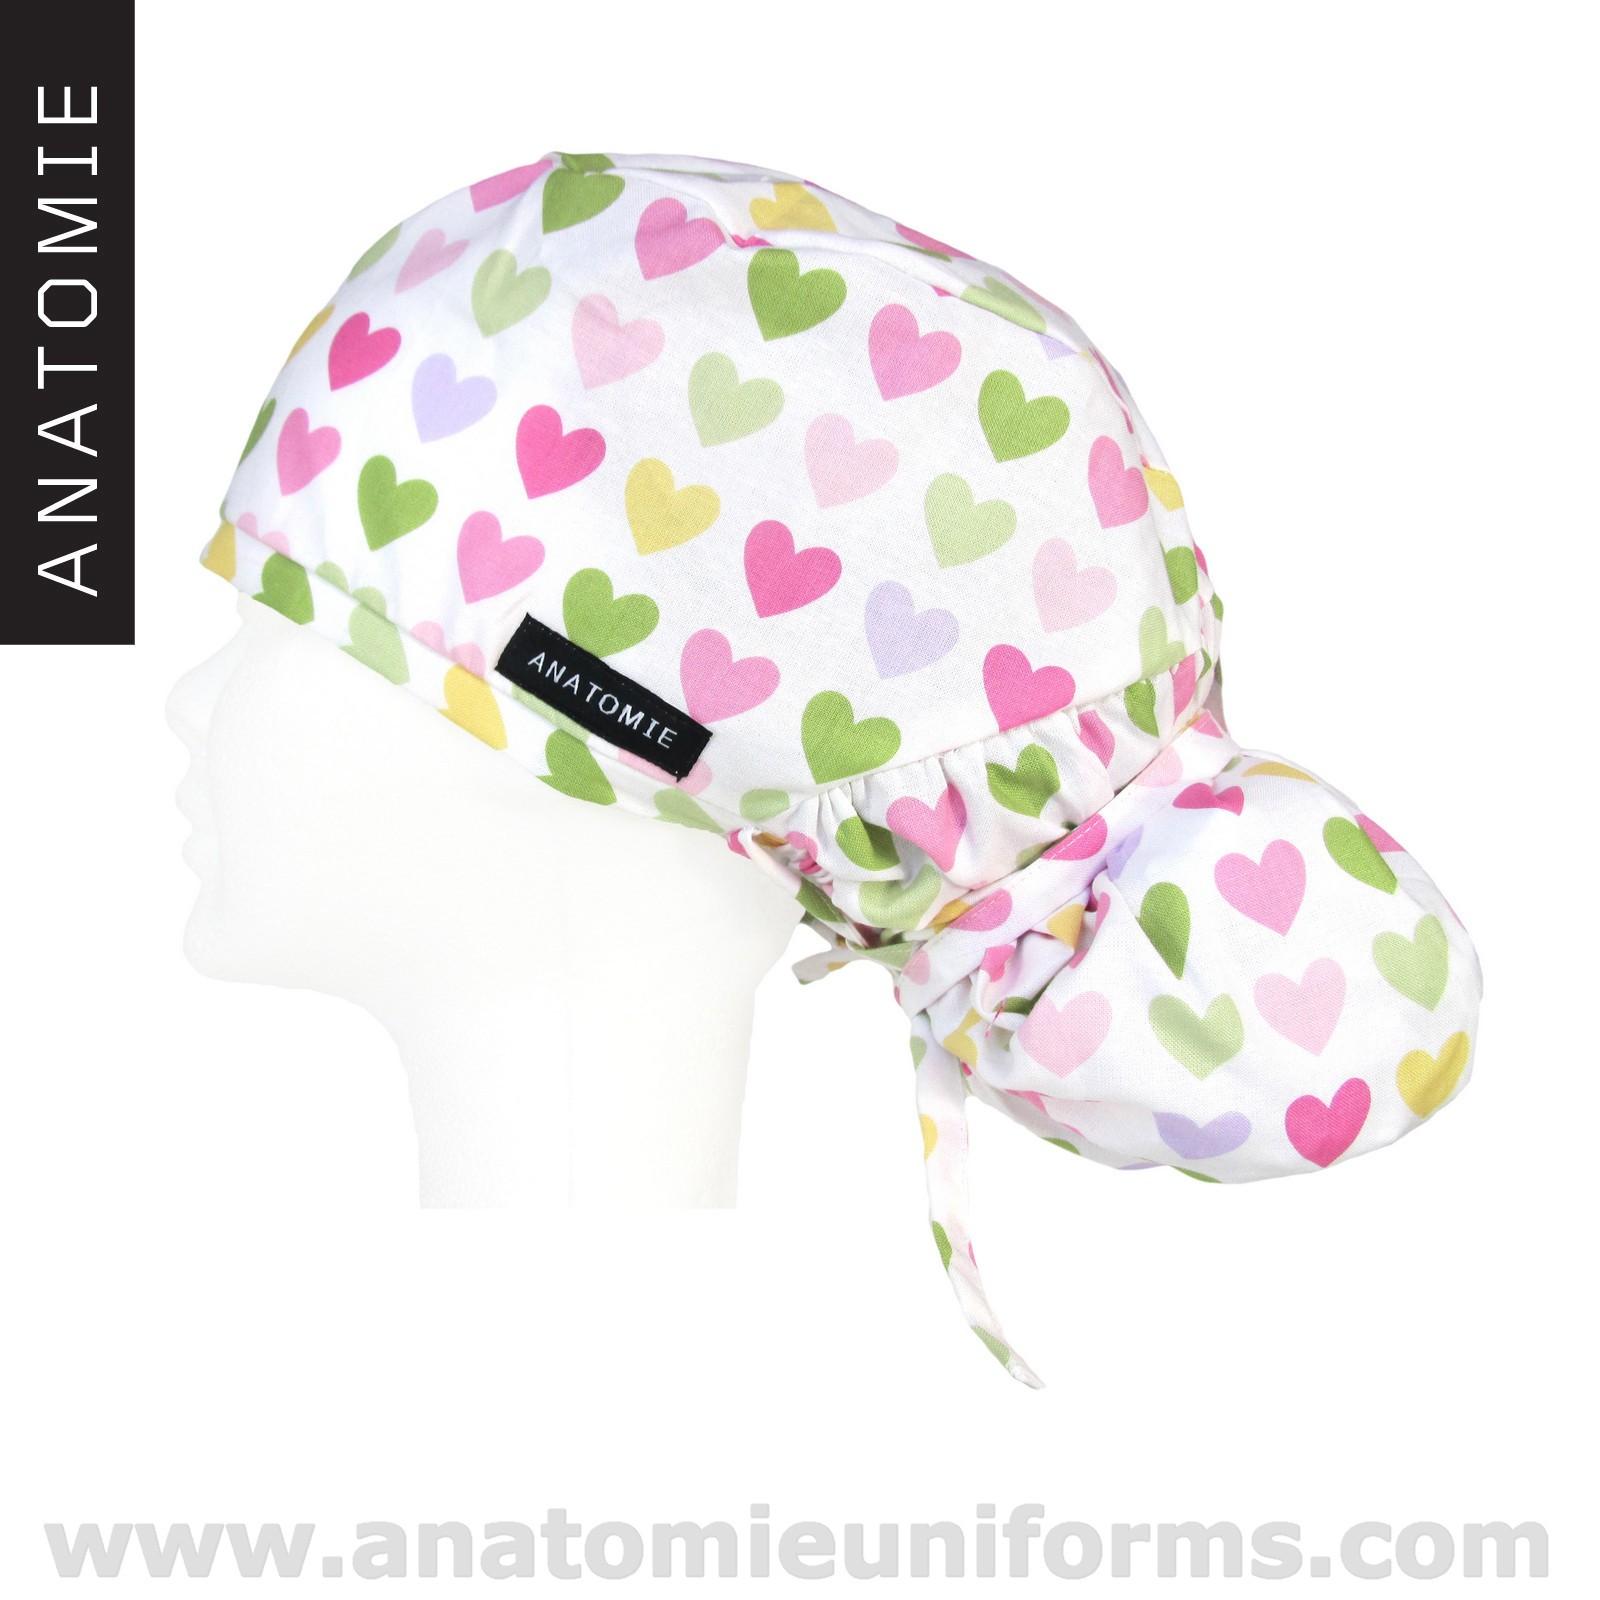 ANATOMIE Surgical Caps female Hearts - ANA1058